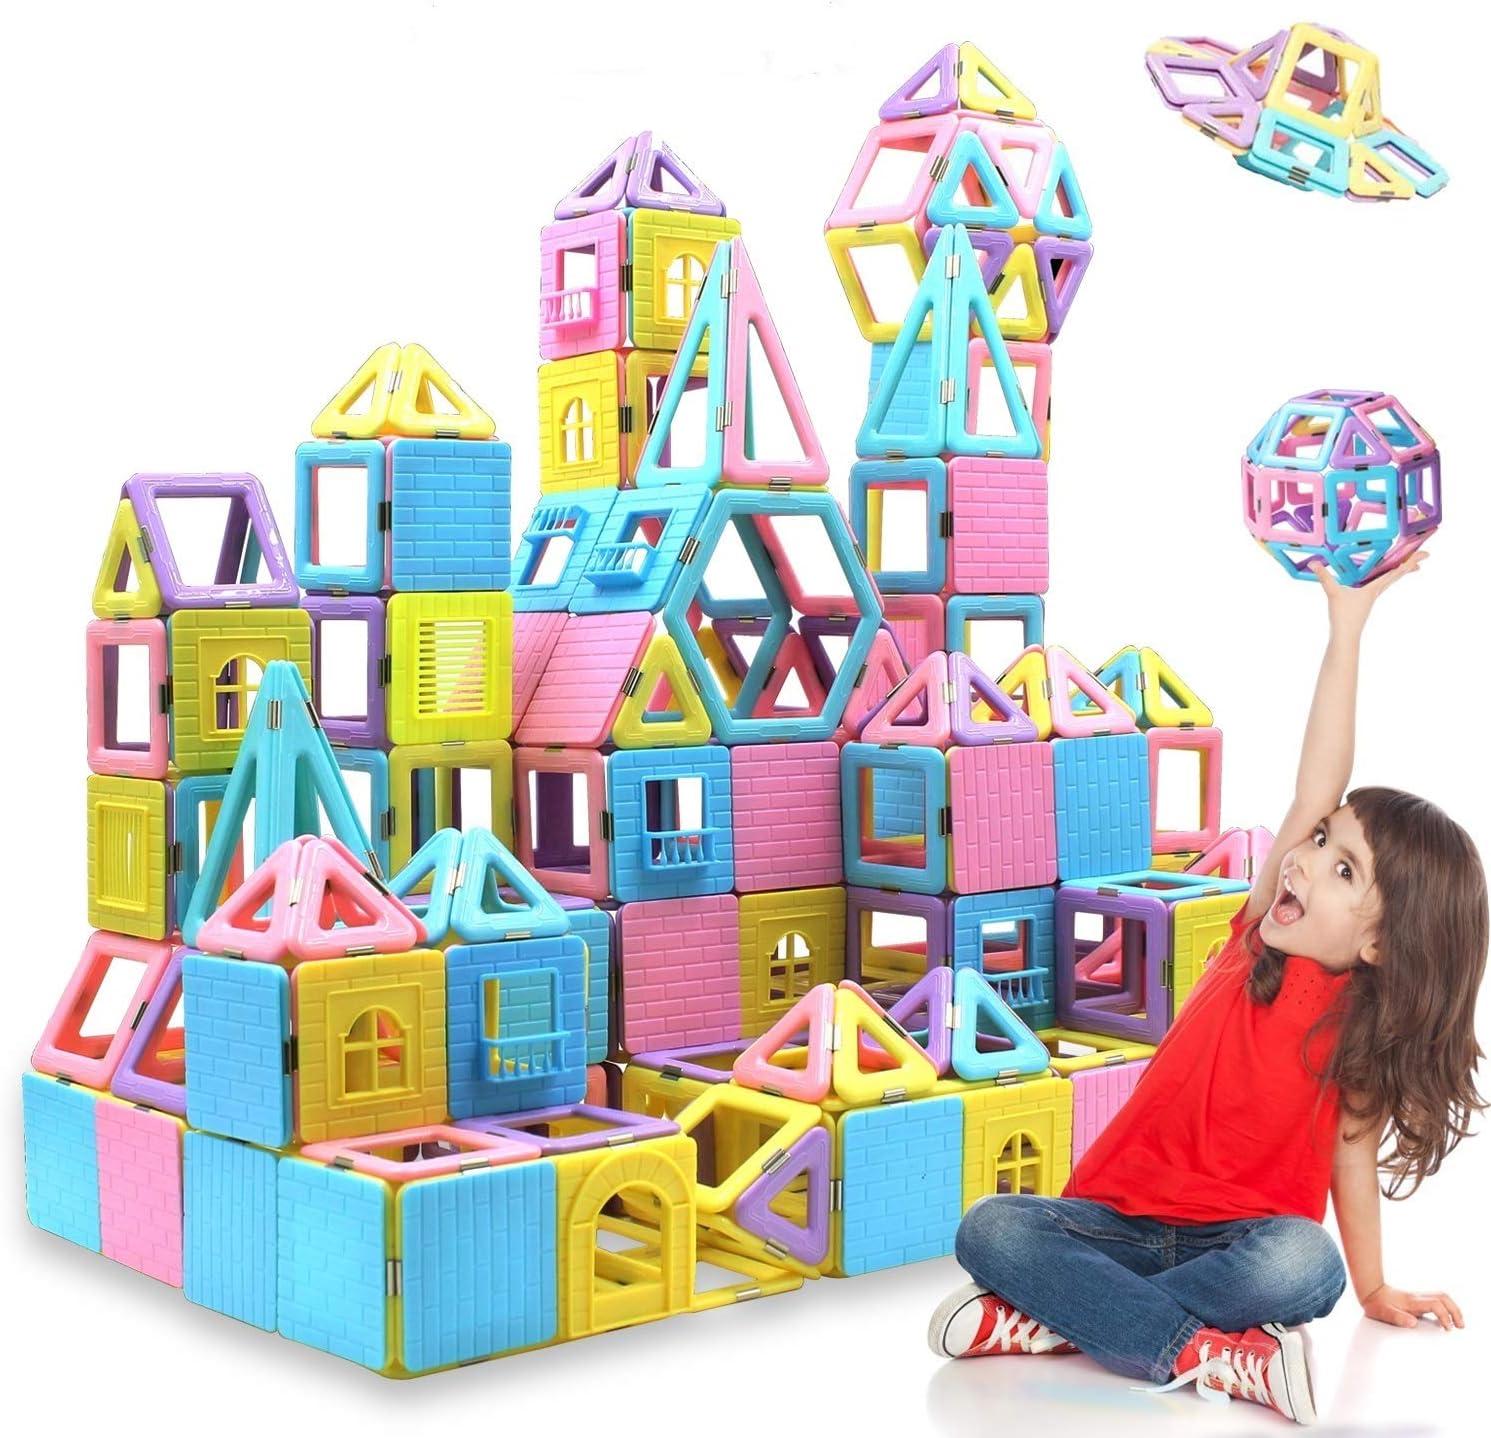 HOMOFY 124PCS Magnetic Building Blocks Magnet Tiles Early Educational &...